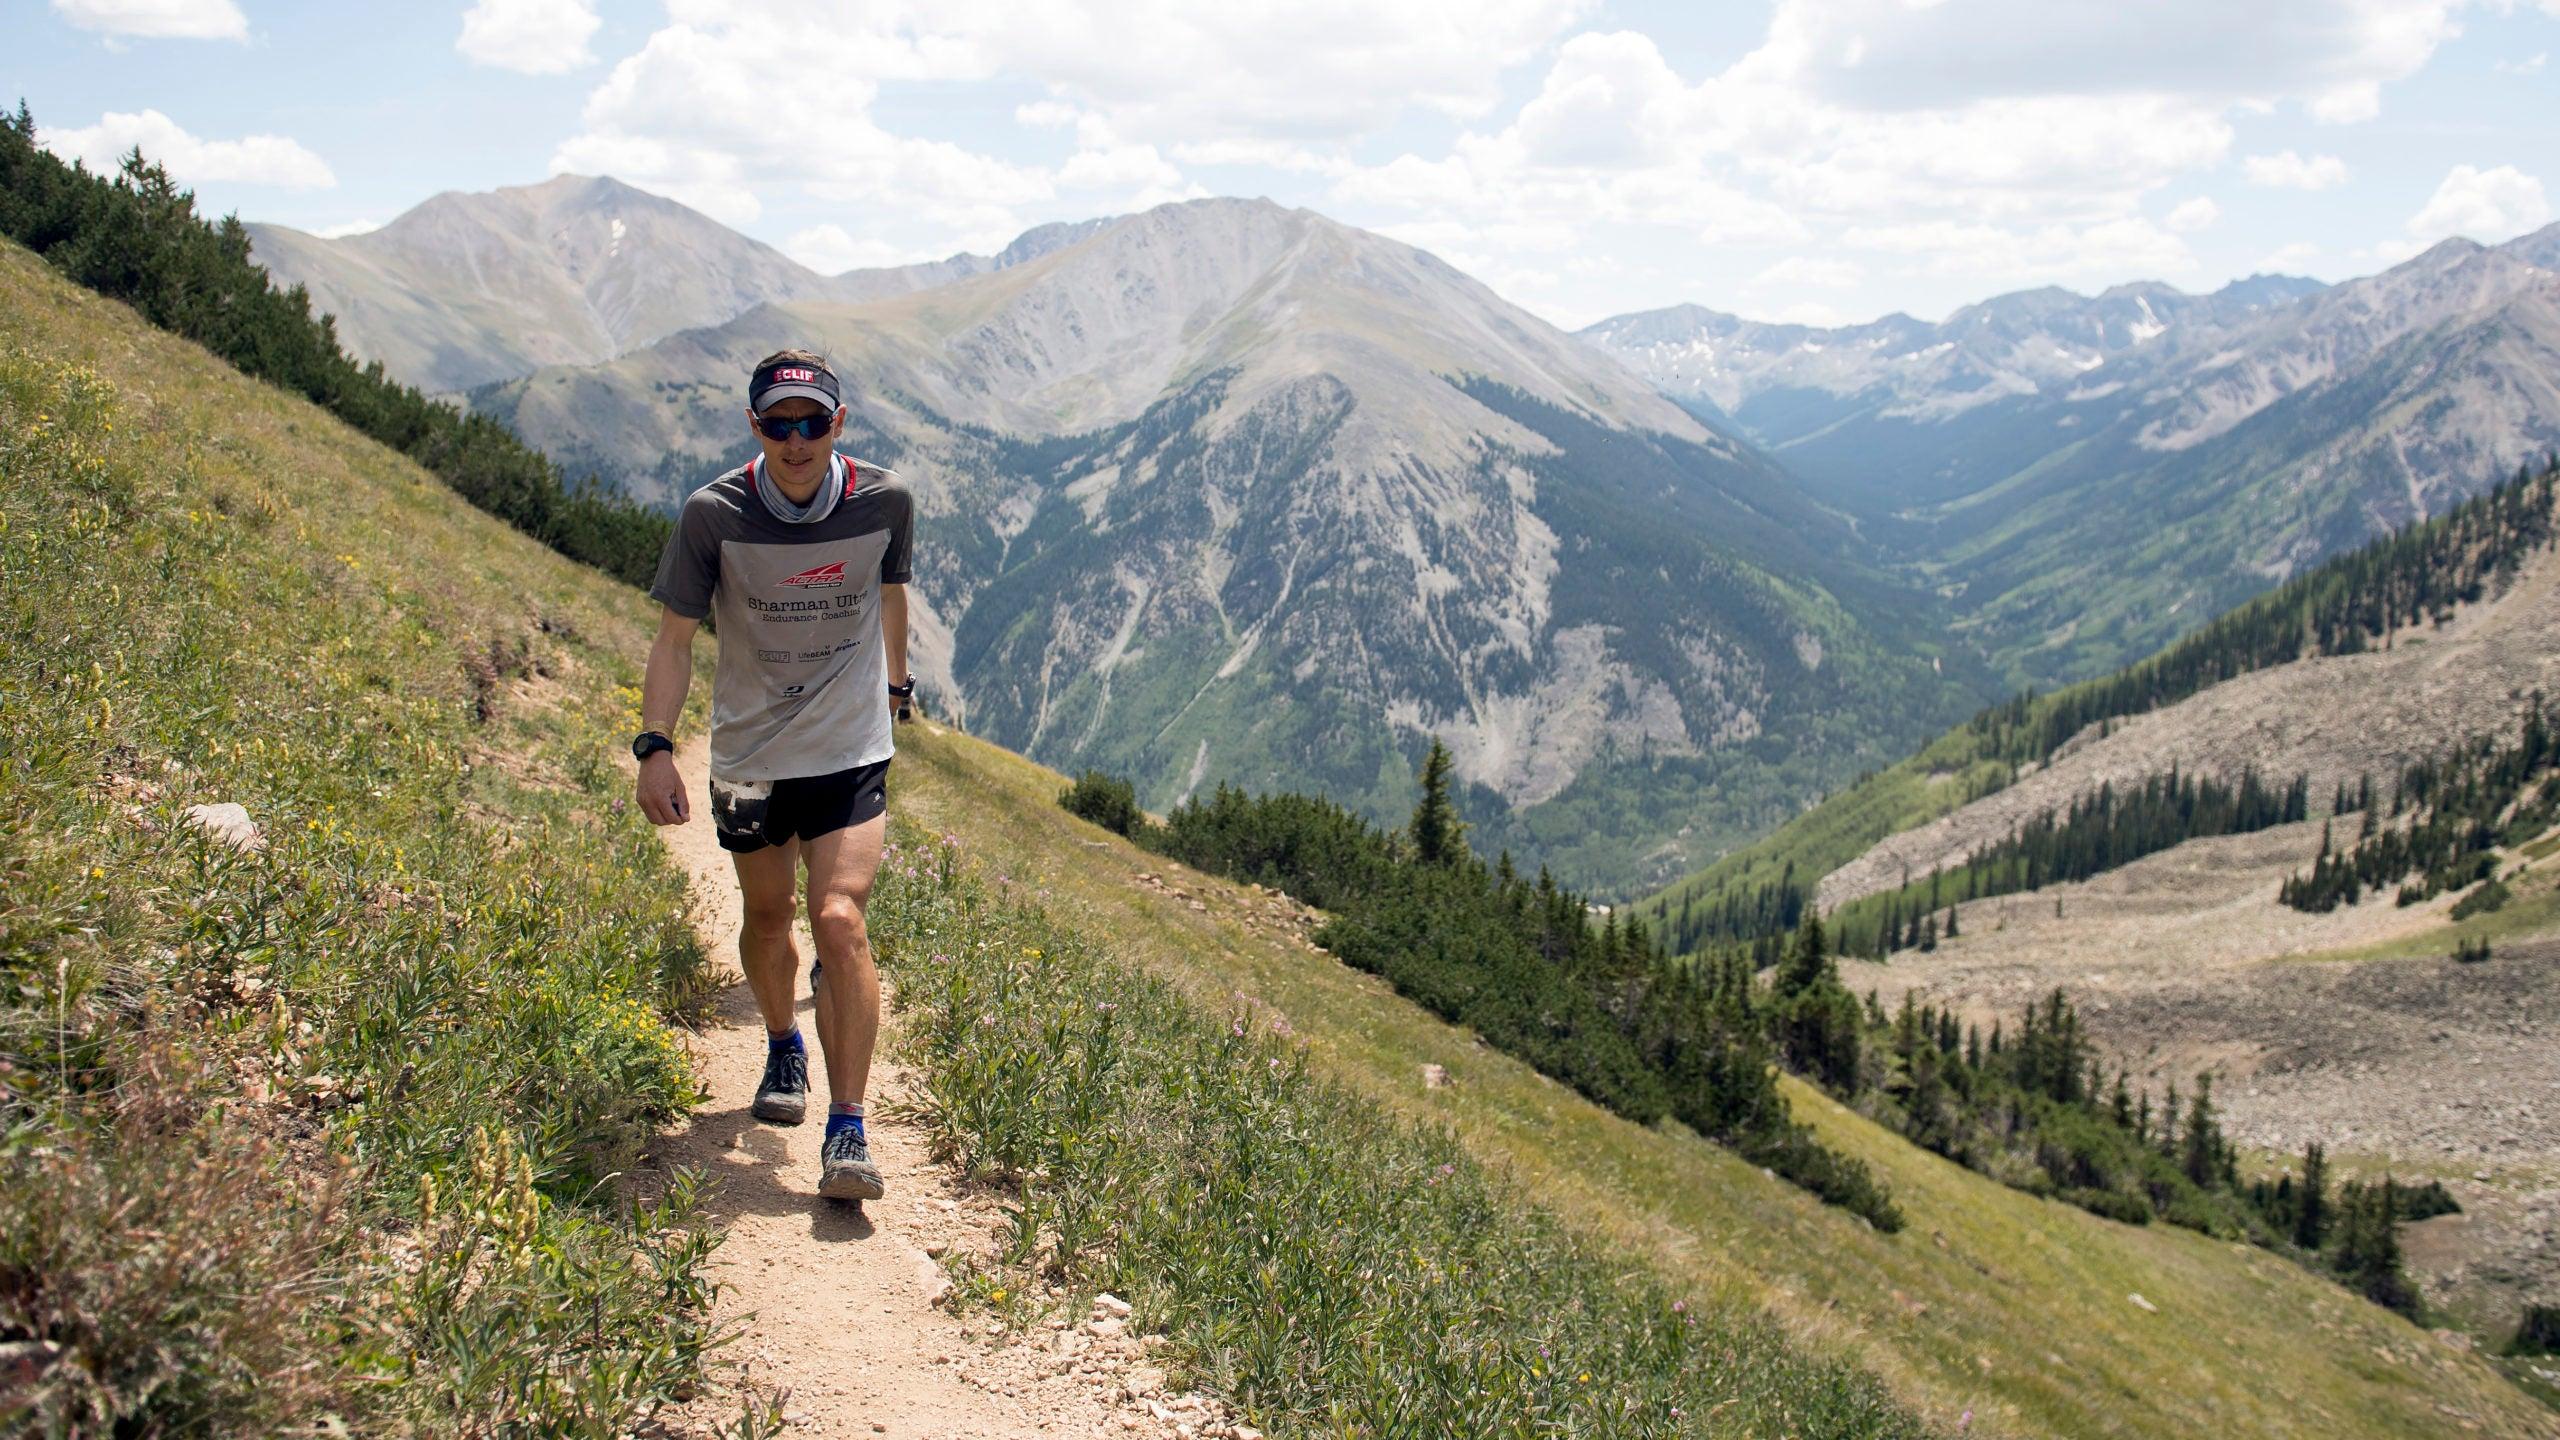 Ian Sharman hiking